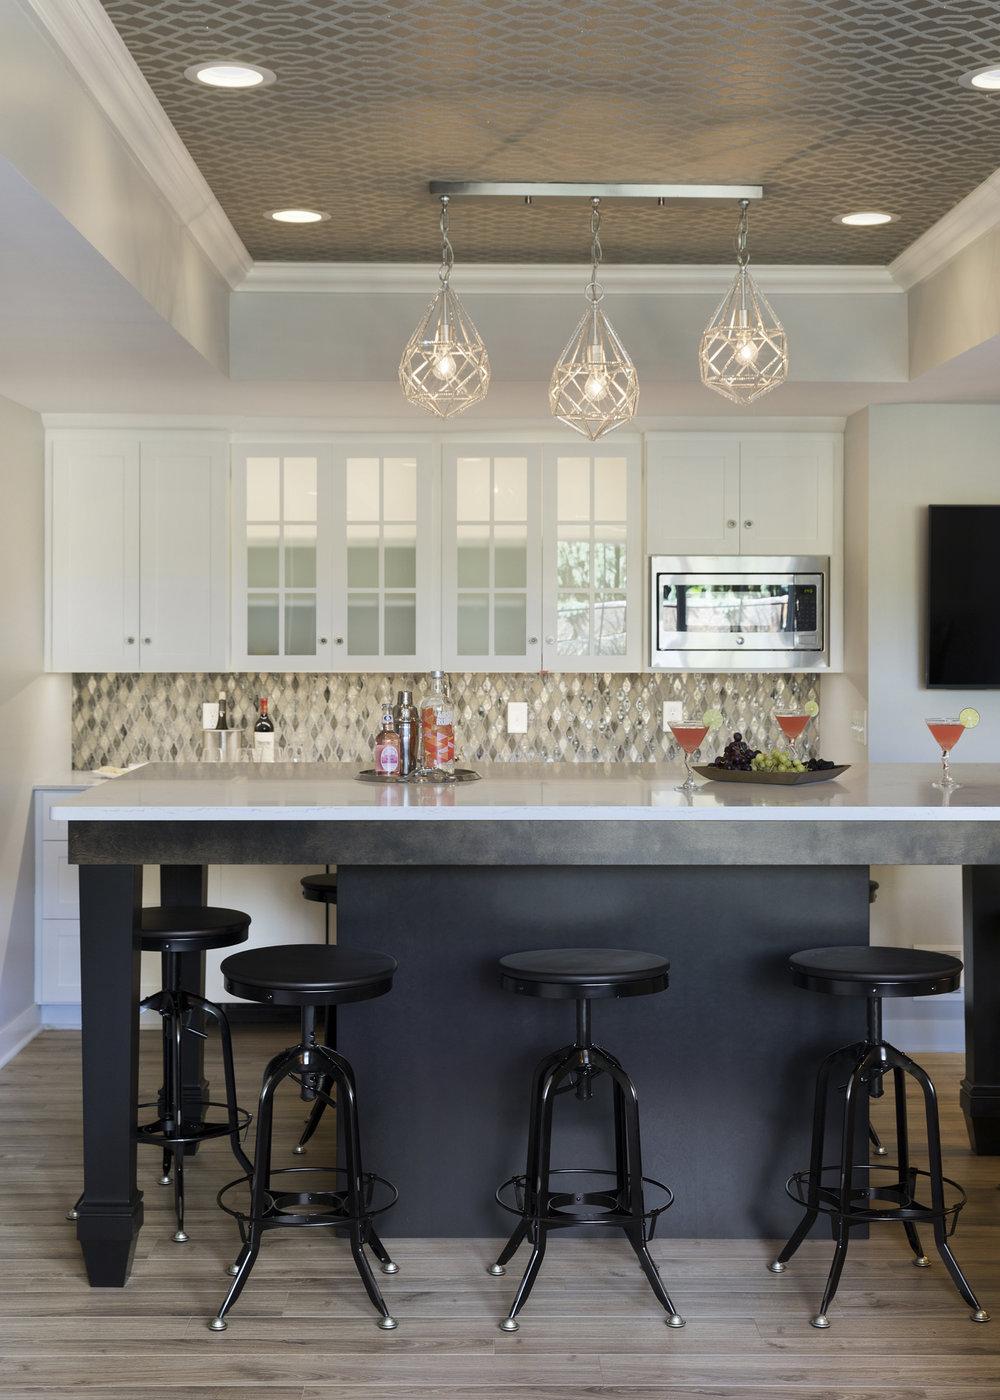 Moms Design Build - Basement Table Remodel Wallpaper